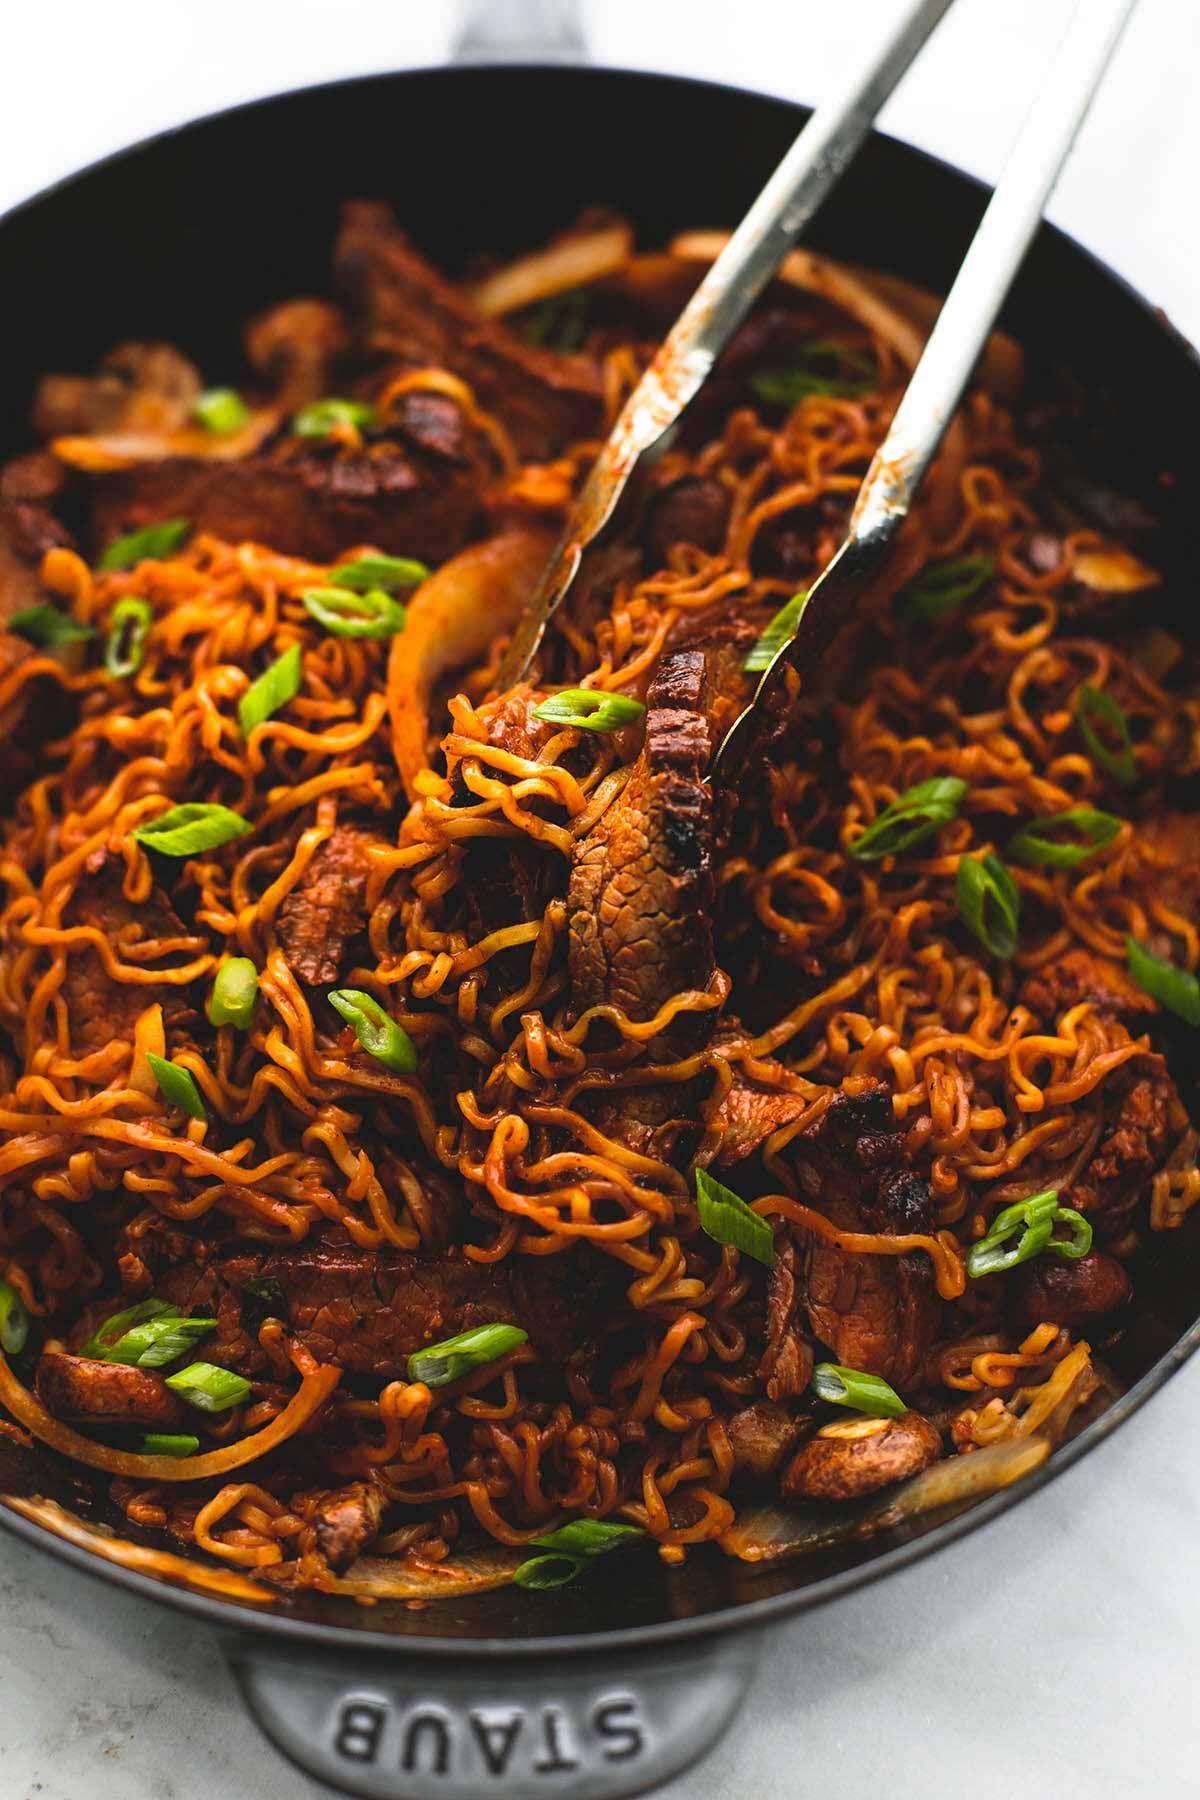 One pan spicy korean beef noodles recipe made with a simple korean one pan spicy korean beef noodles recipe made with a simple korean marinade and ramen noodles forumfinder Gallery